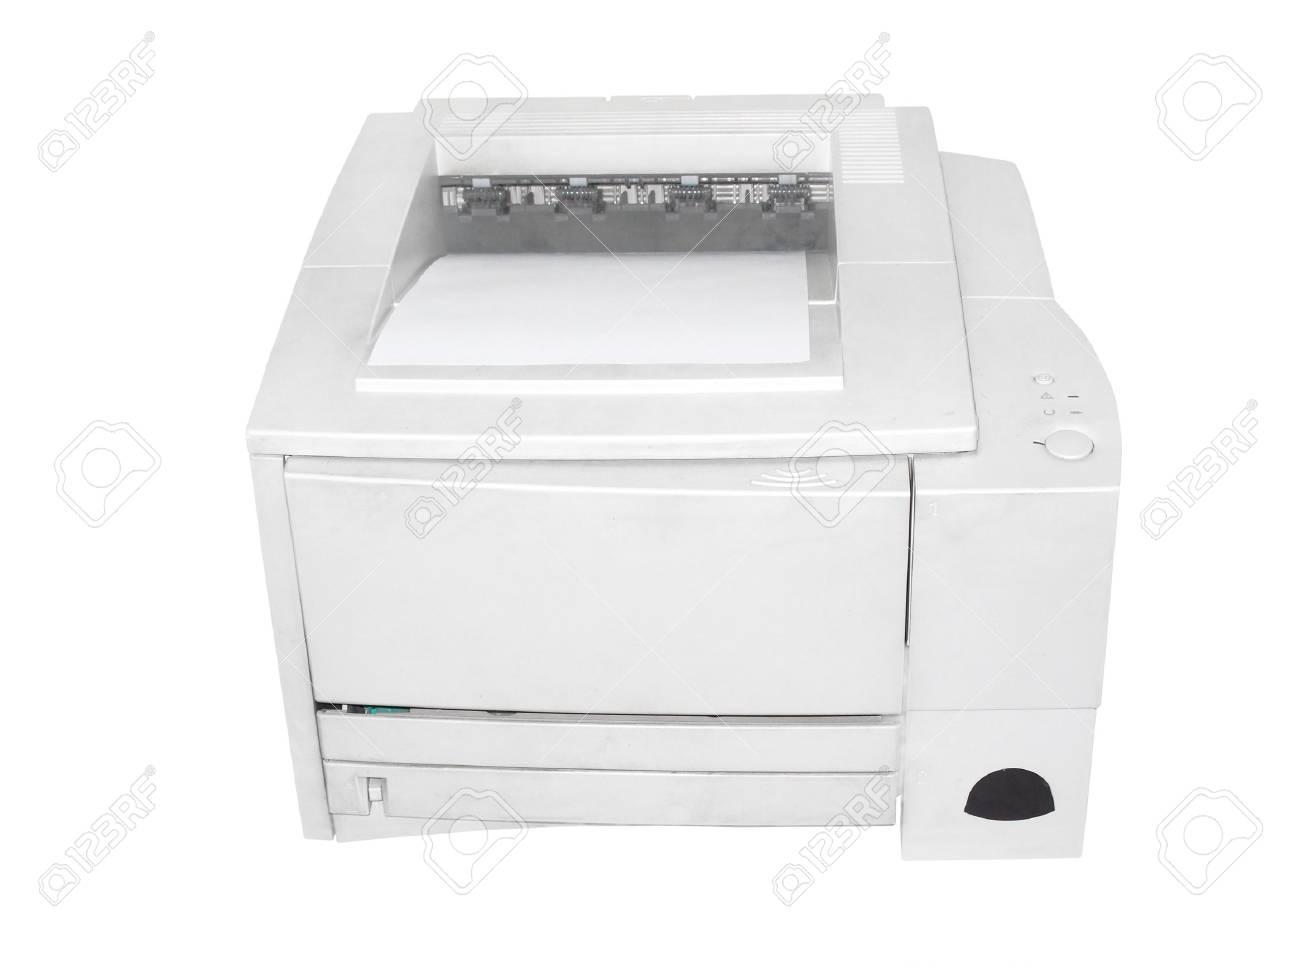 printer under the white background Stock Photo - 6125494